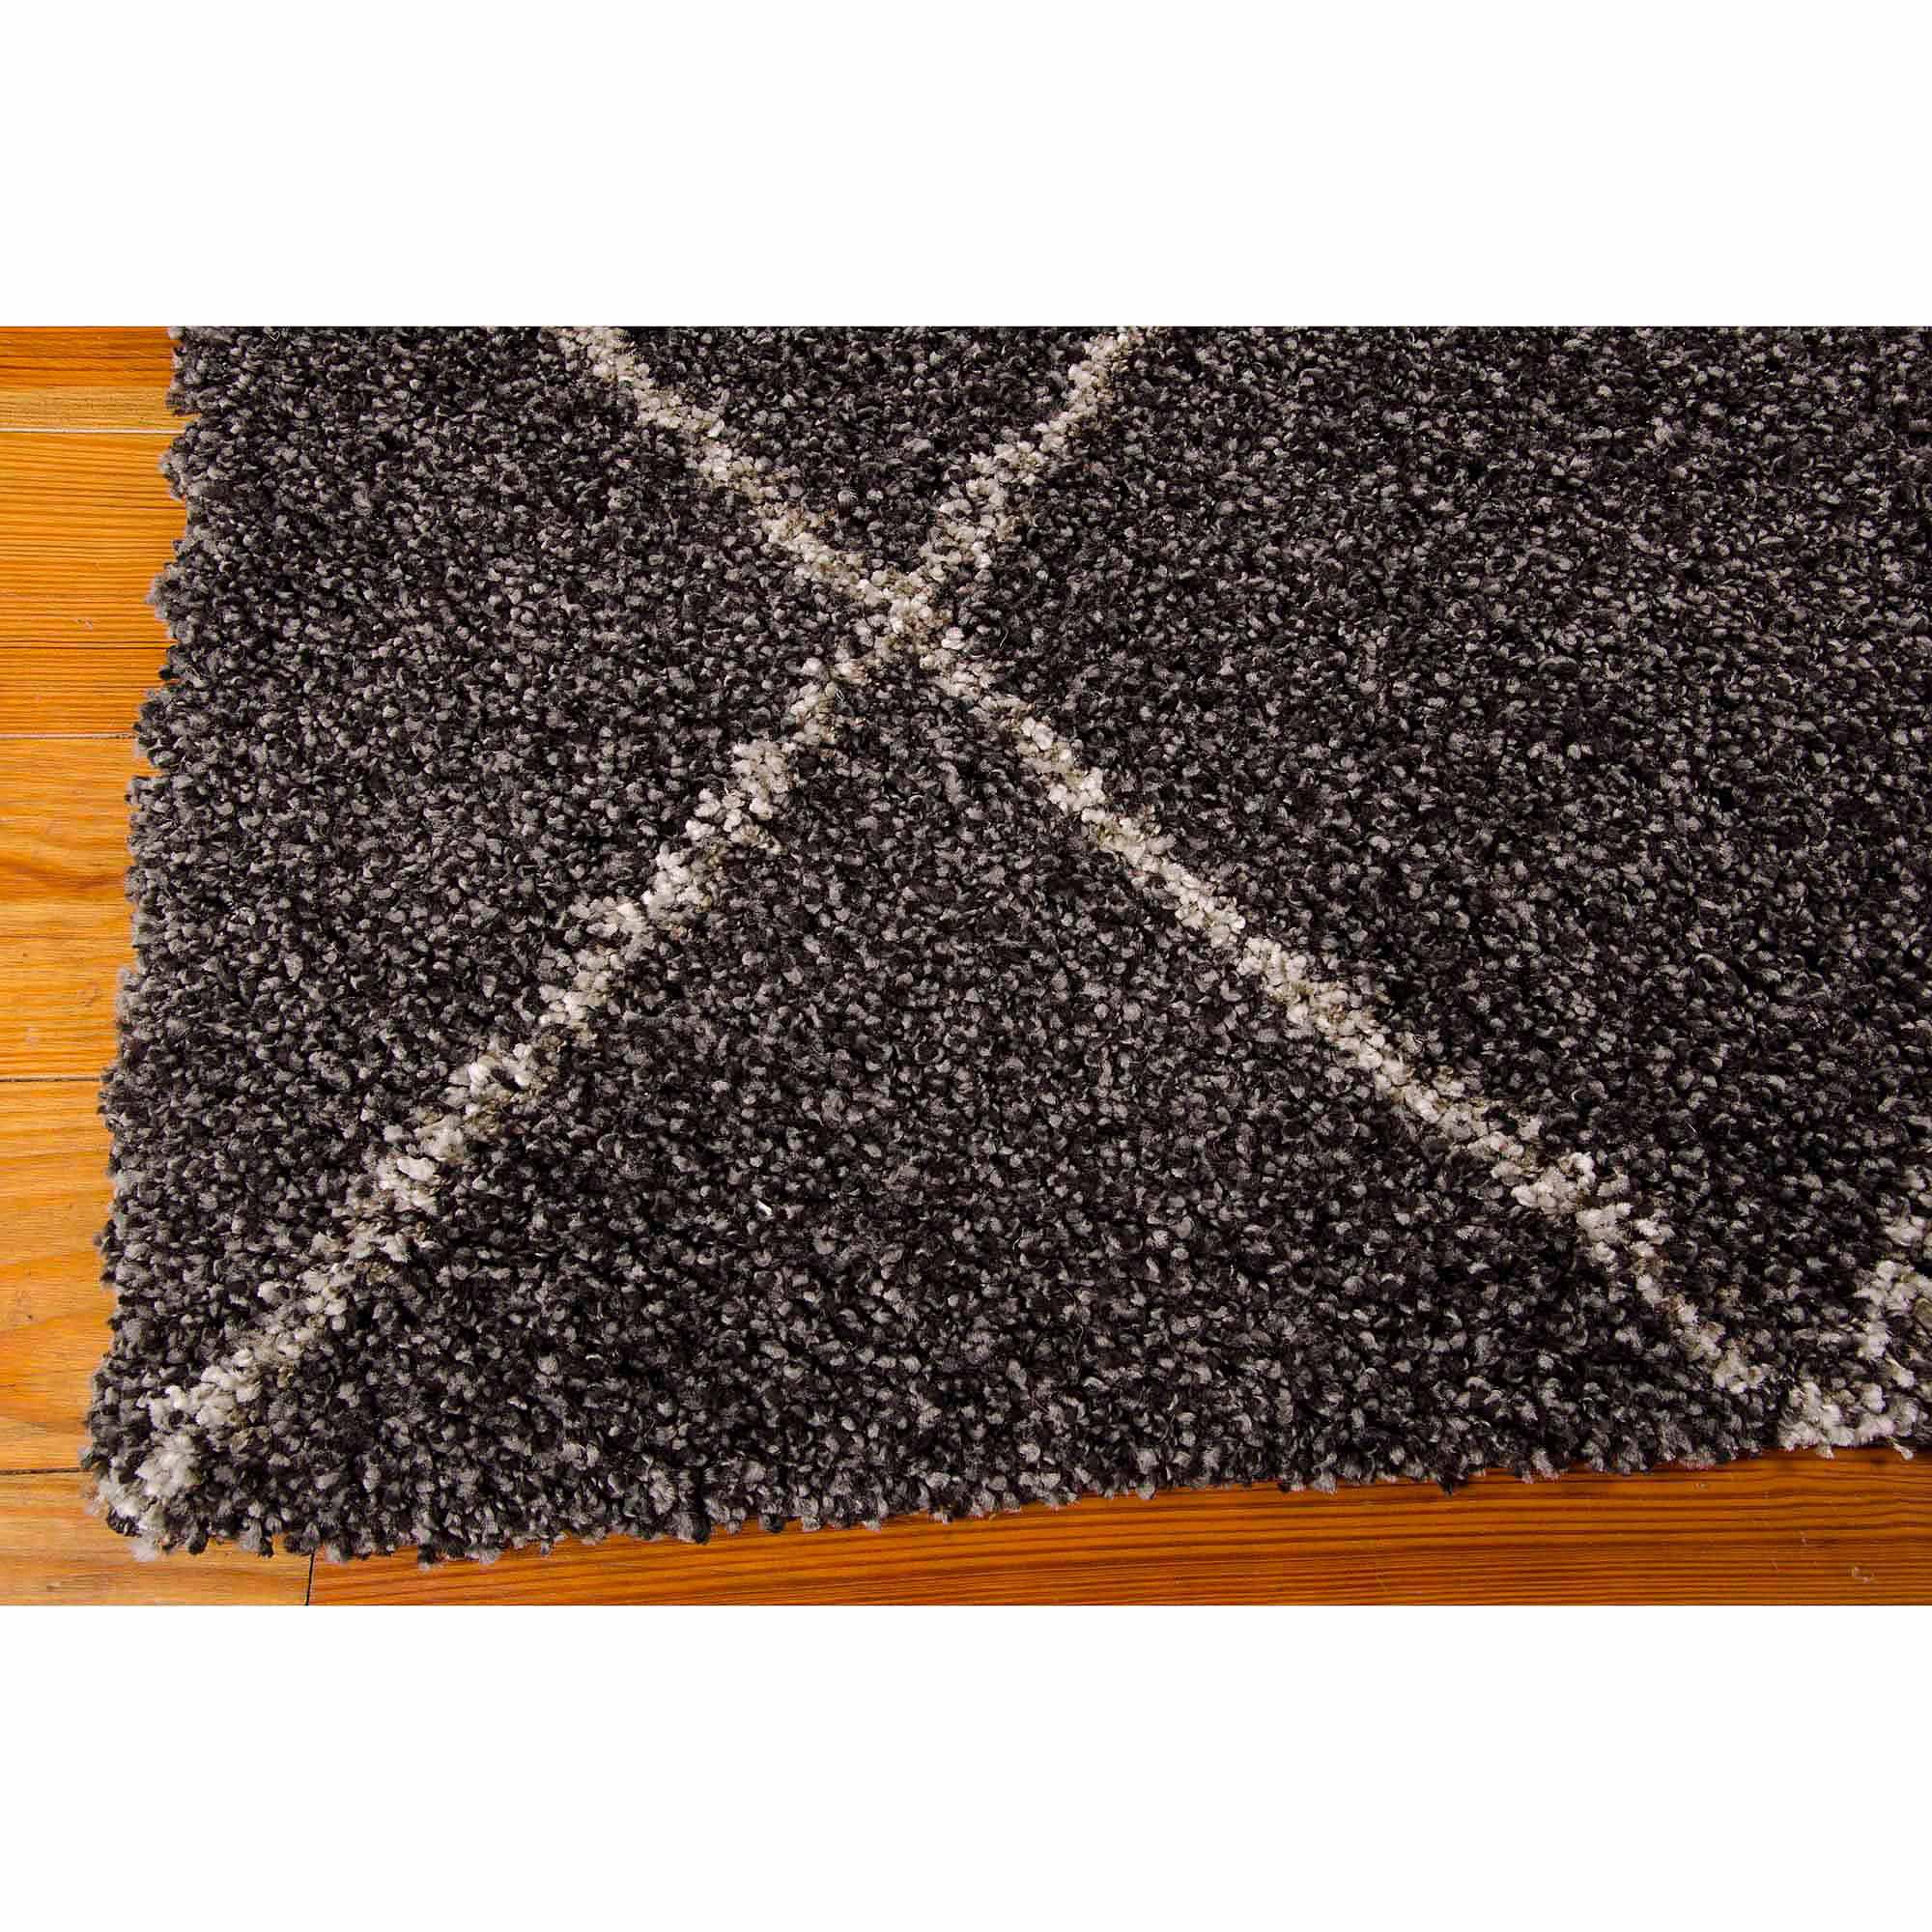 Floor rugs brisbane roselawnlutheran floor rugs brisbane xcyyxh com baanklon Image collections